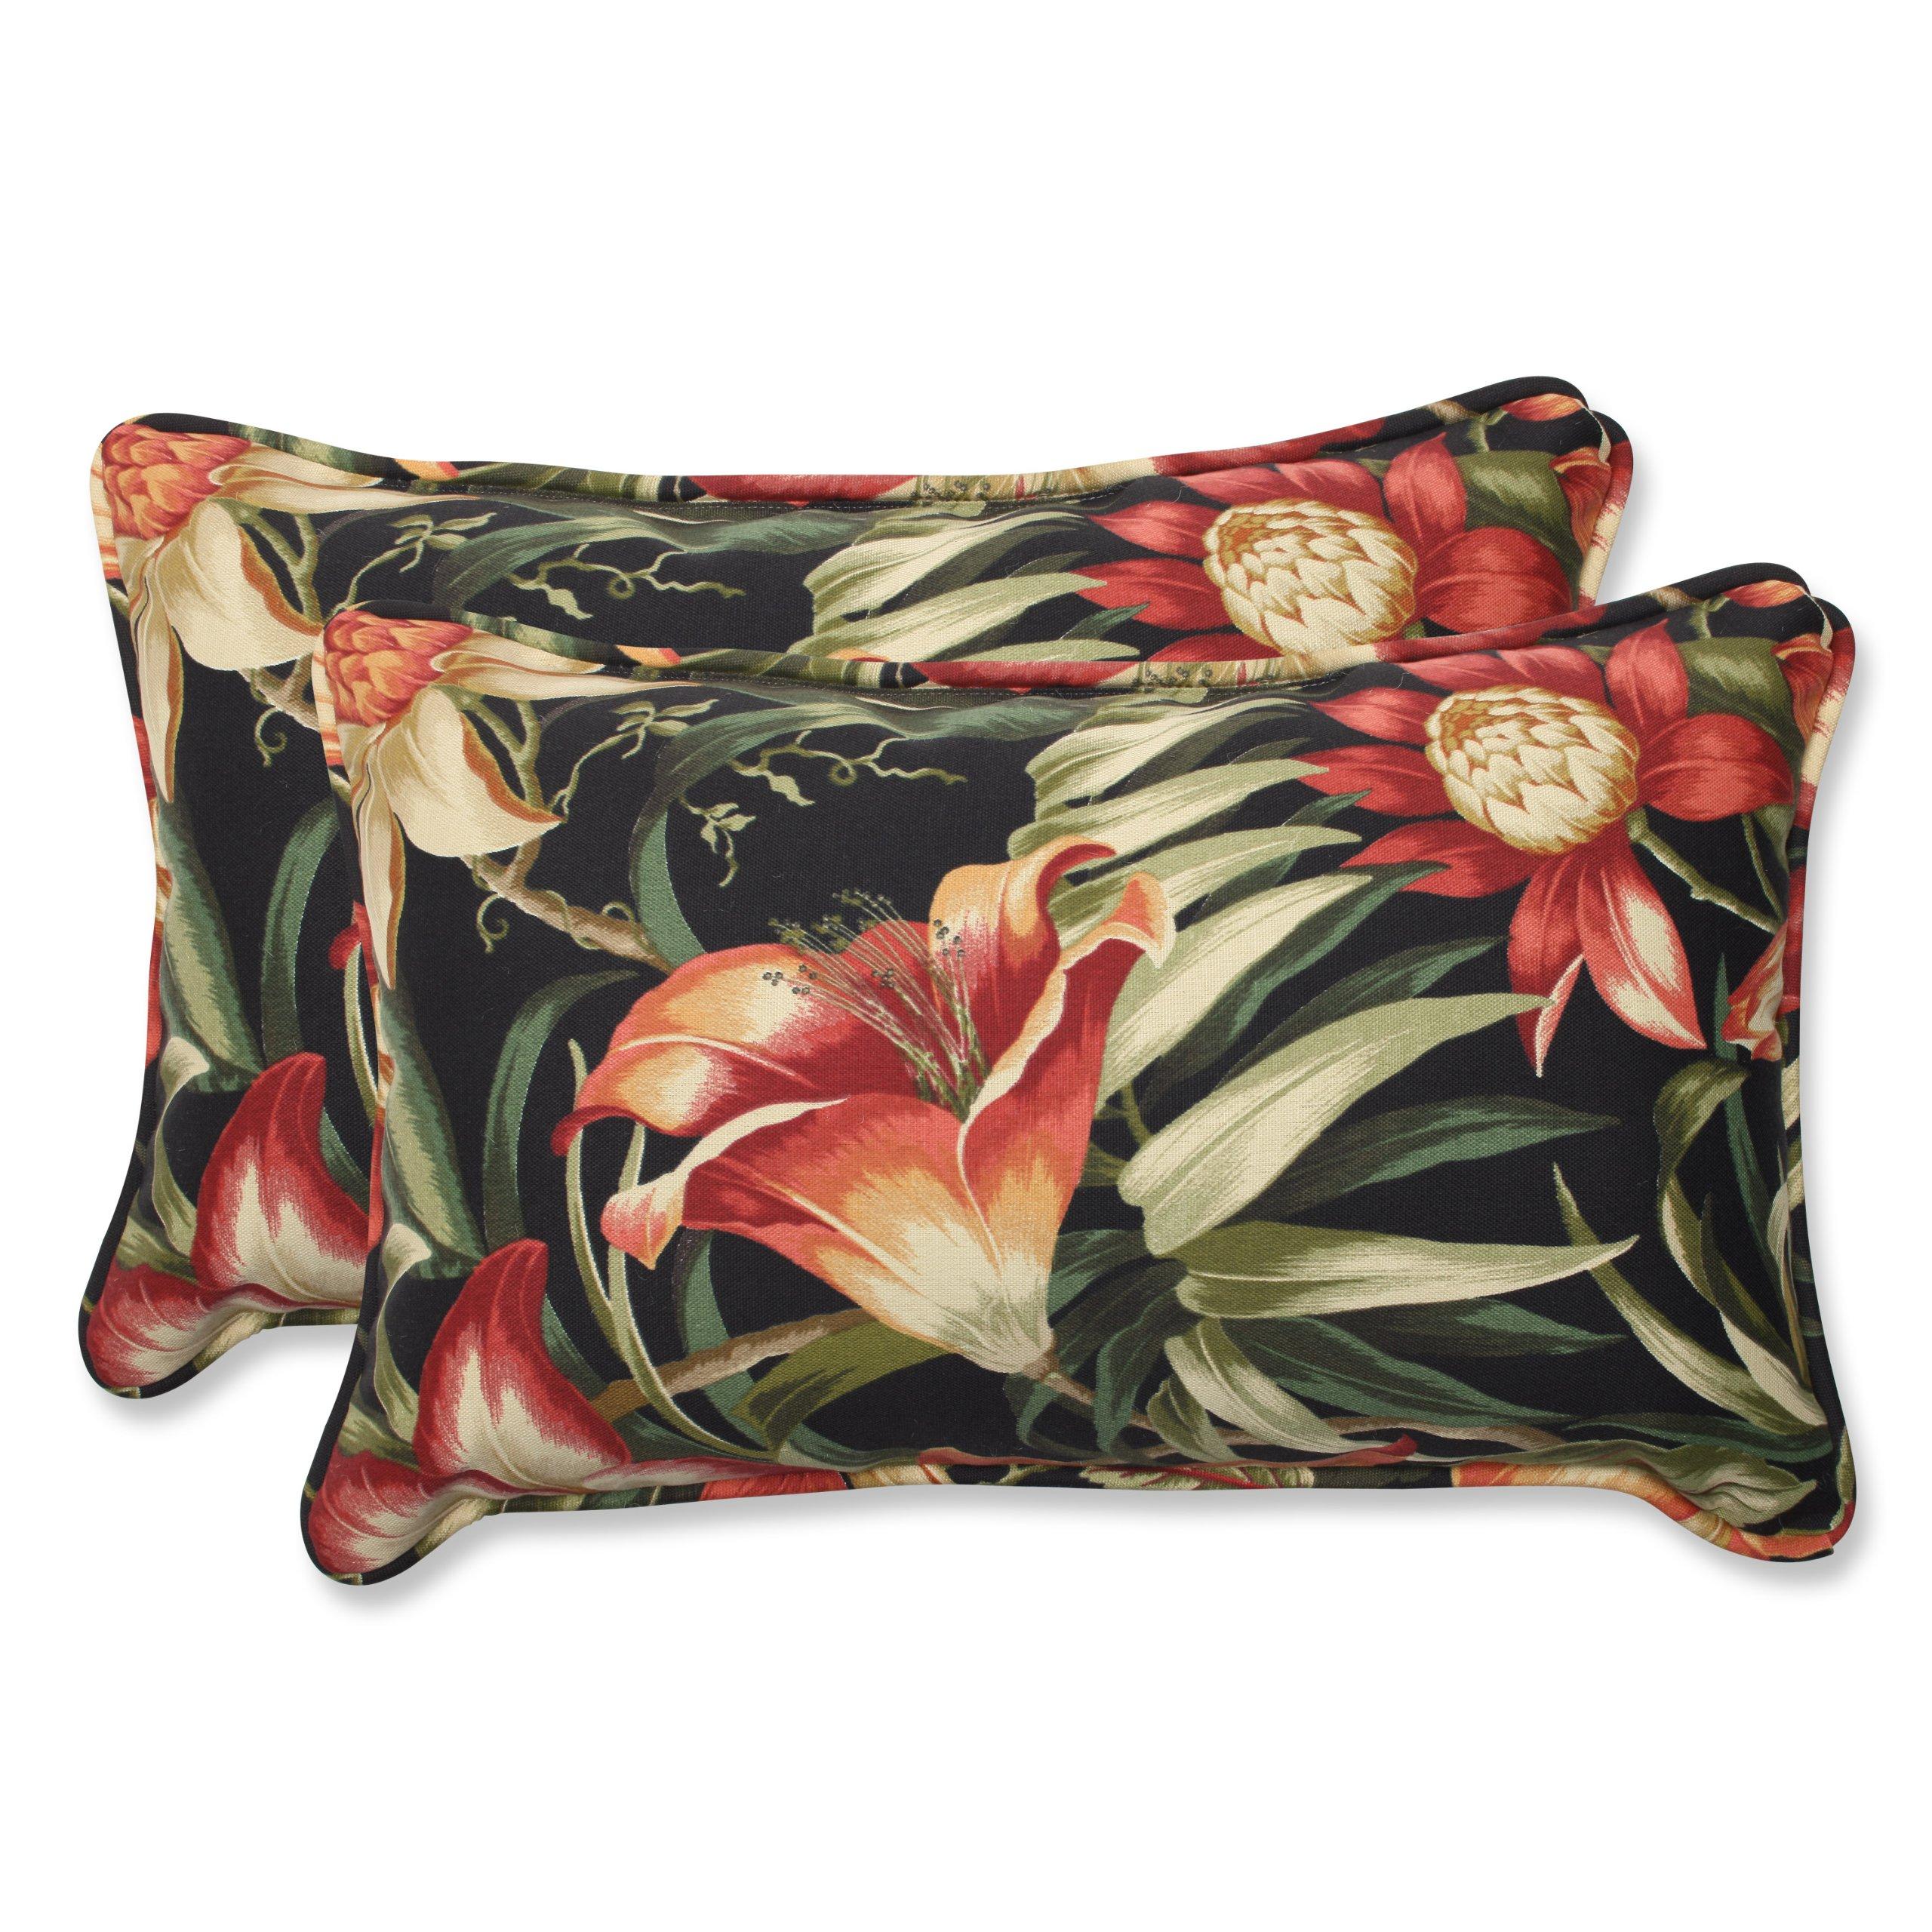 Pillow Perfect Outdoor Throw Pillow image